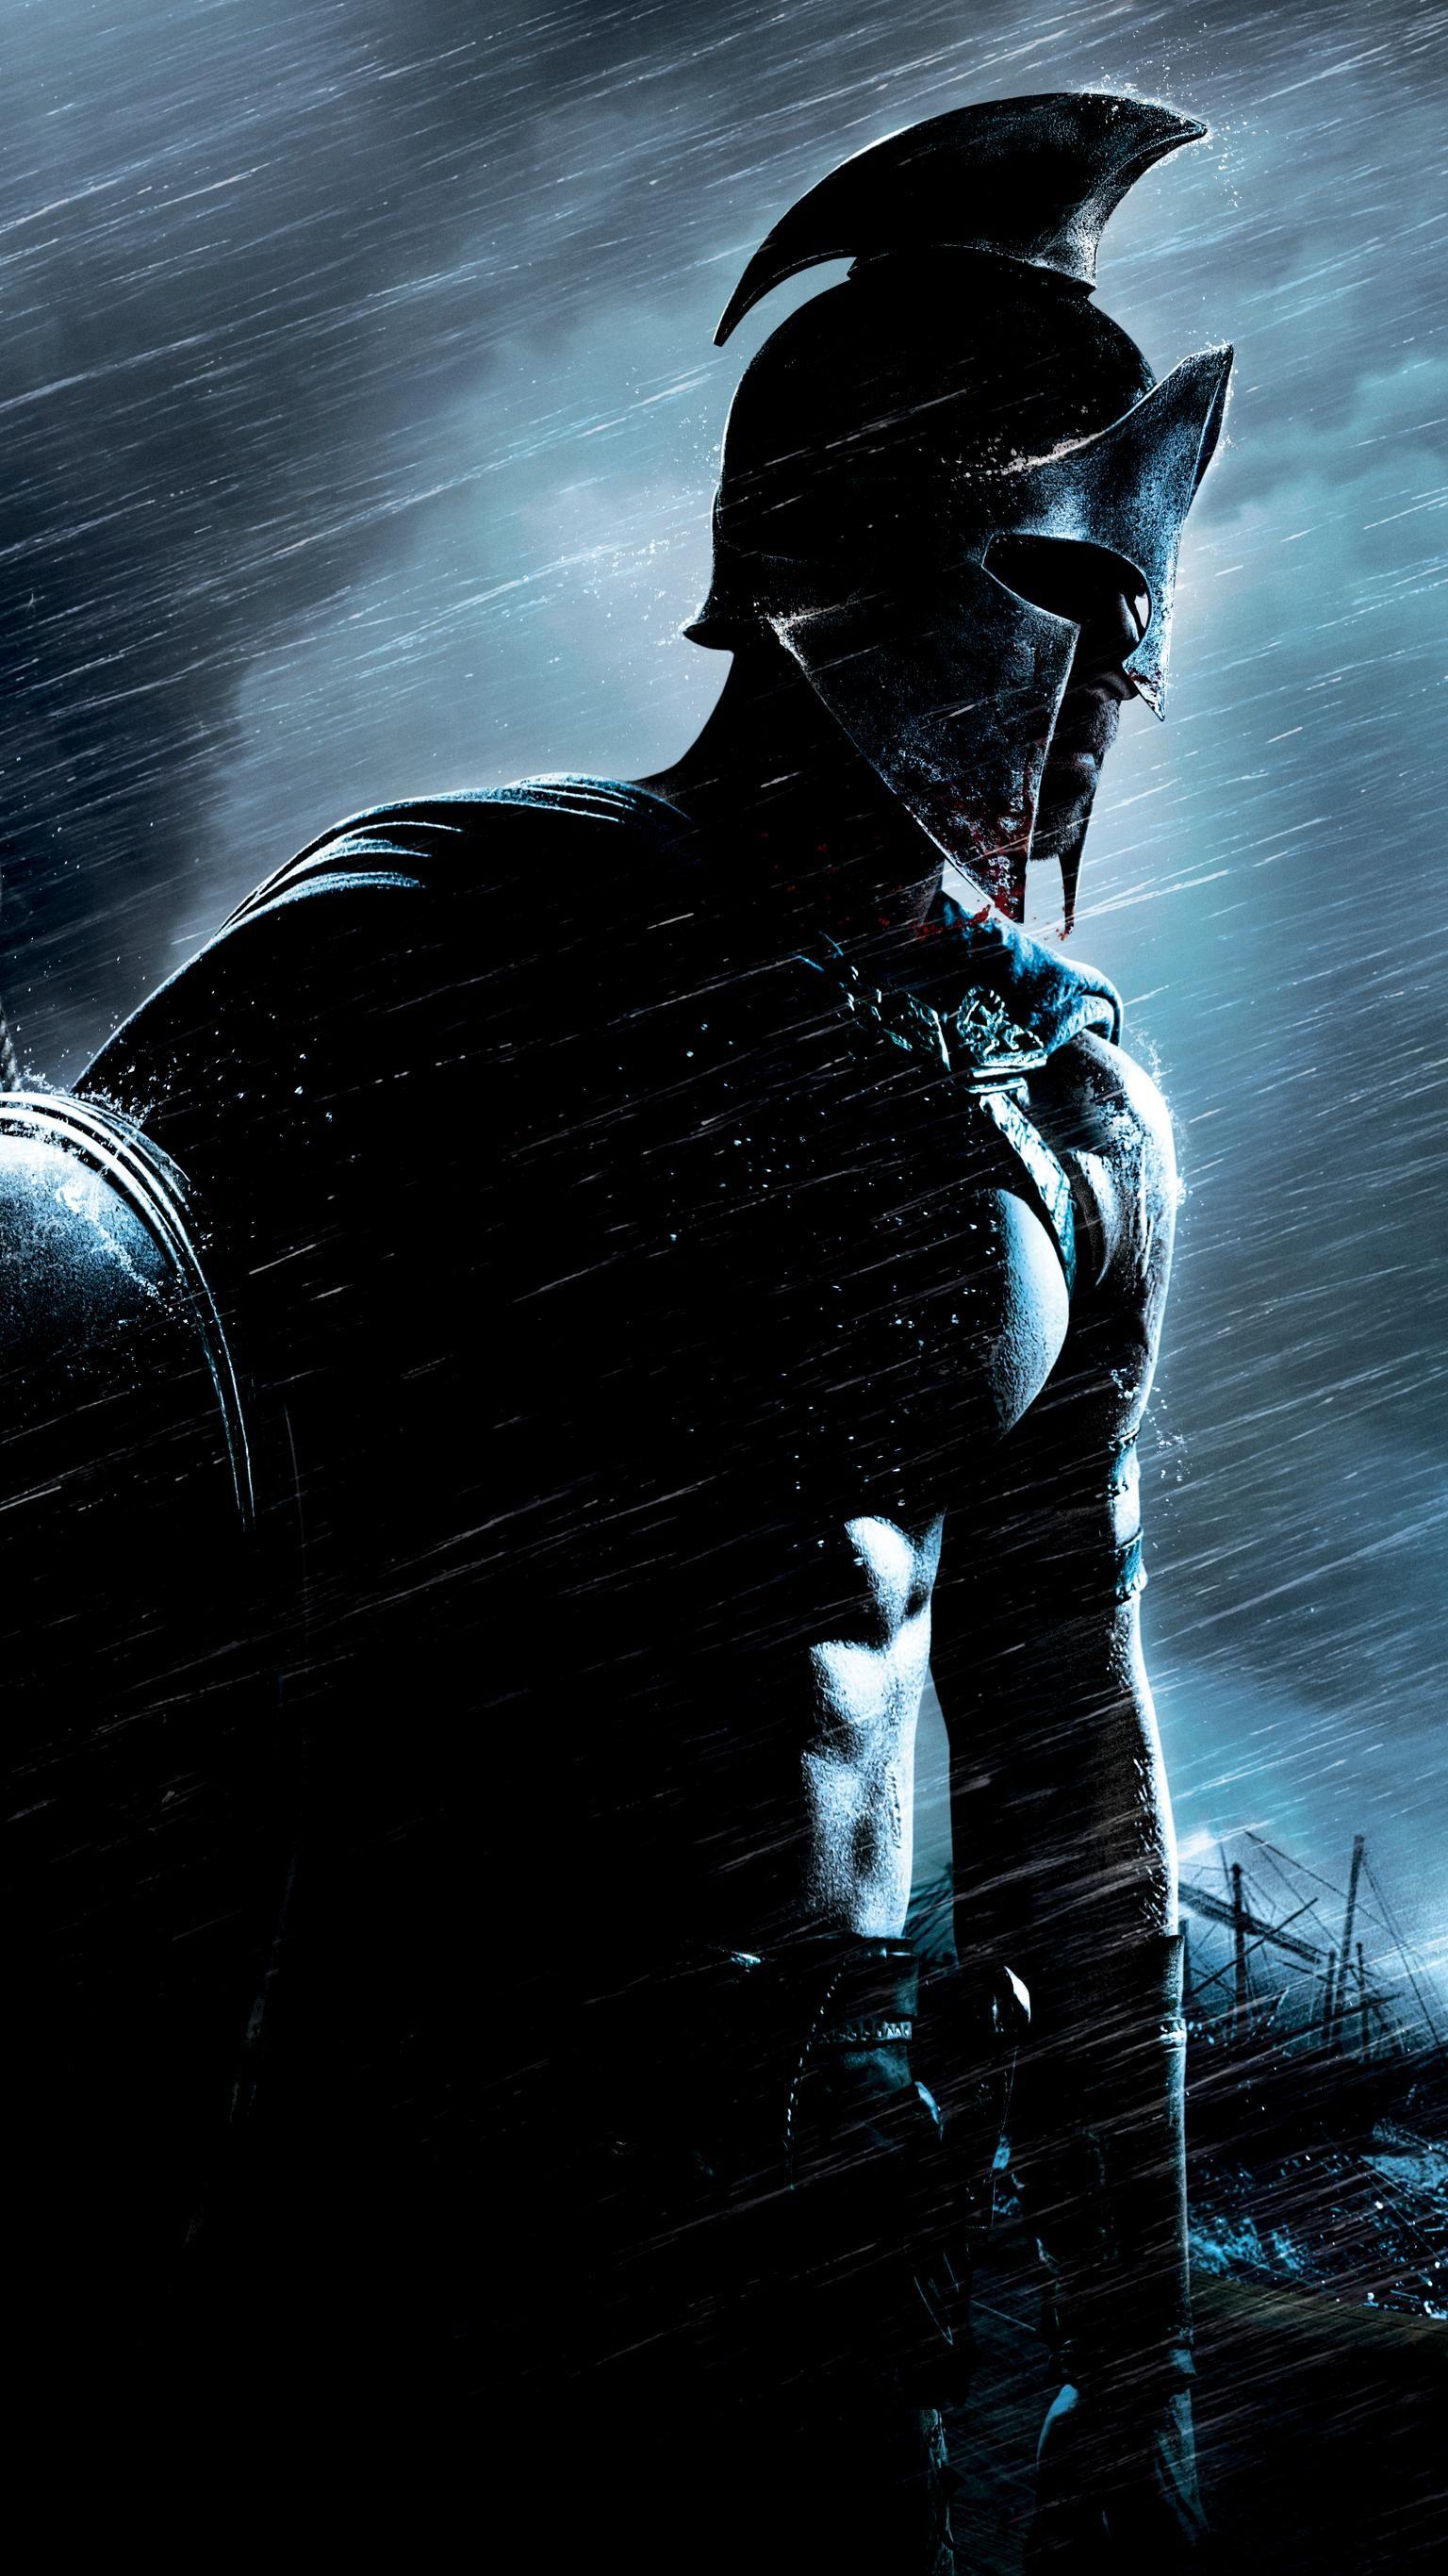 300 Rise Of An Empire 2014 Phone Wallpaper Moviemania Warriors Wallpaper Spartan Warrior 300 Movie